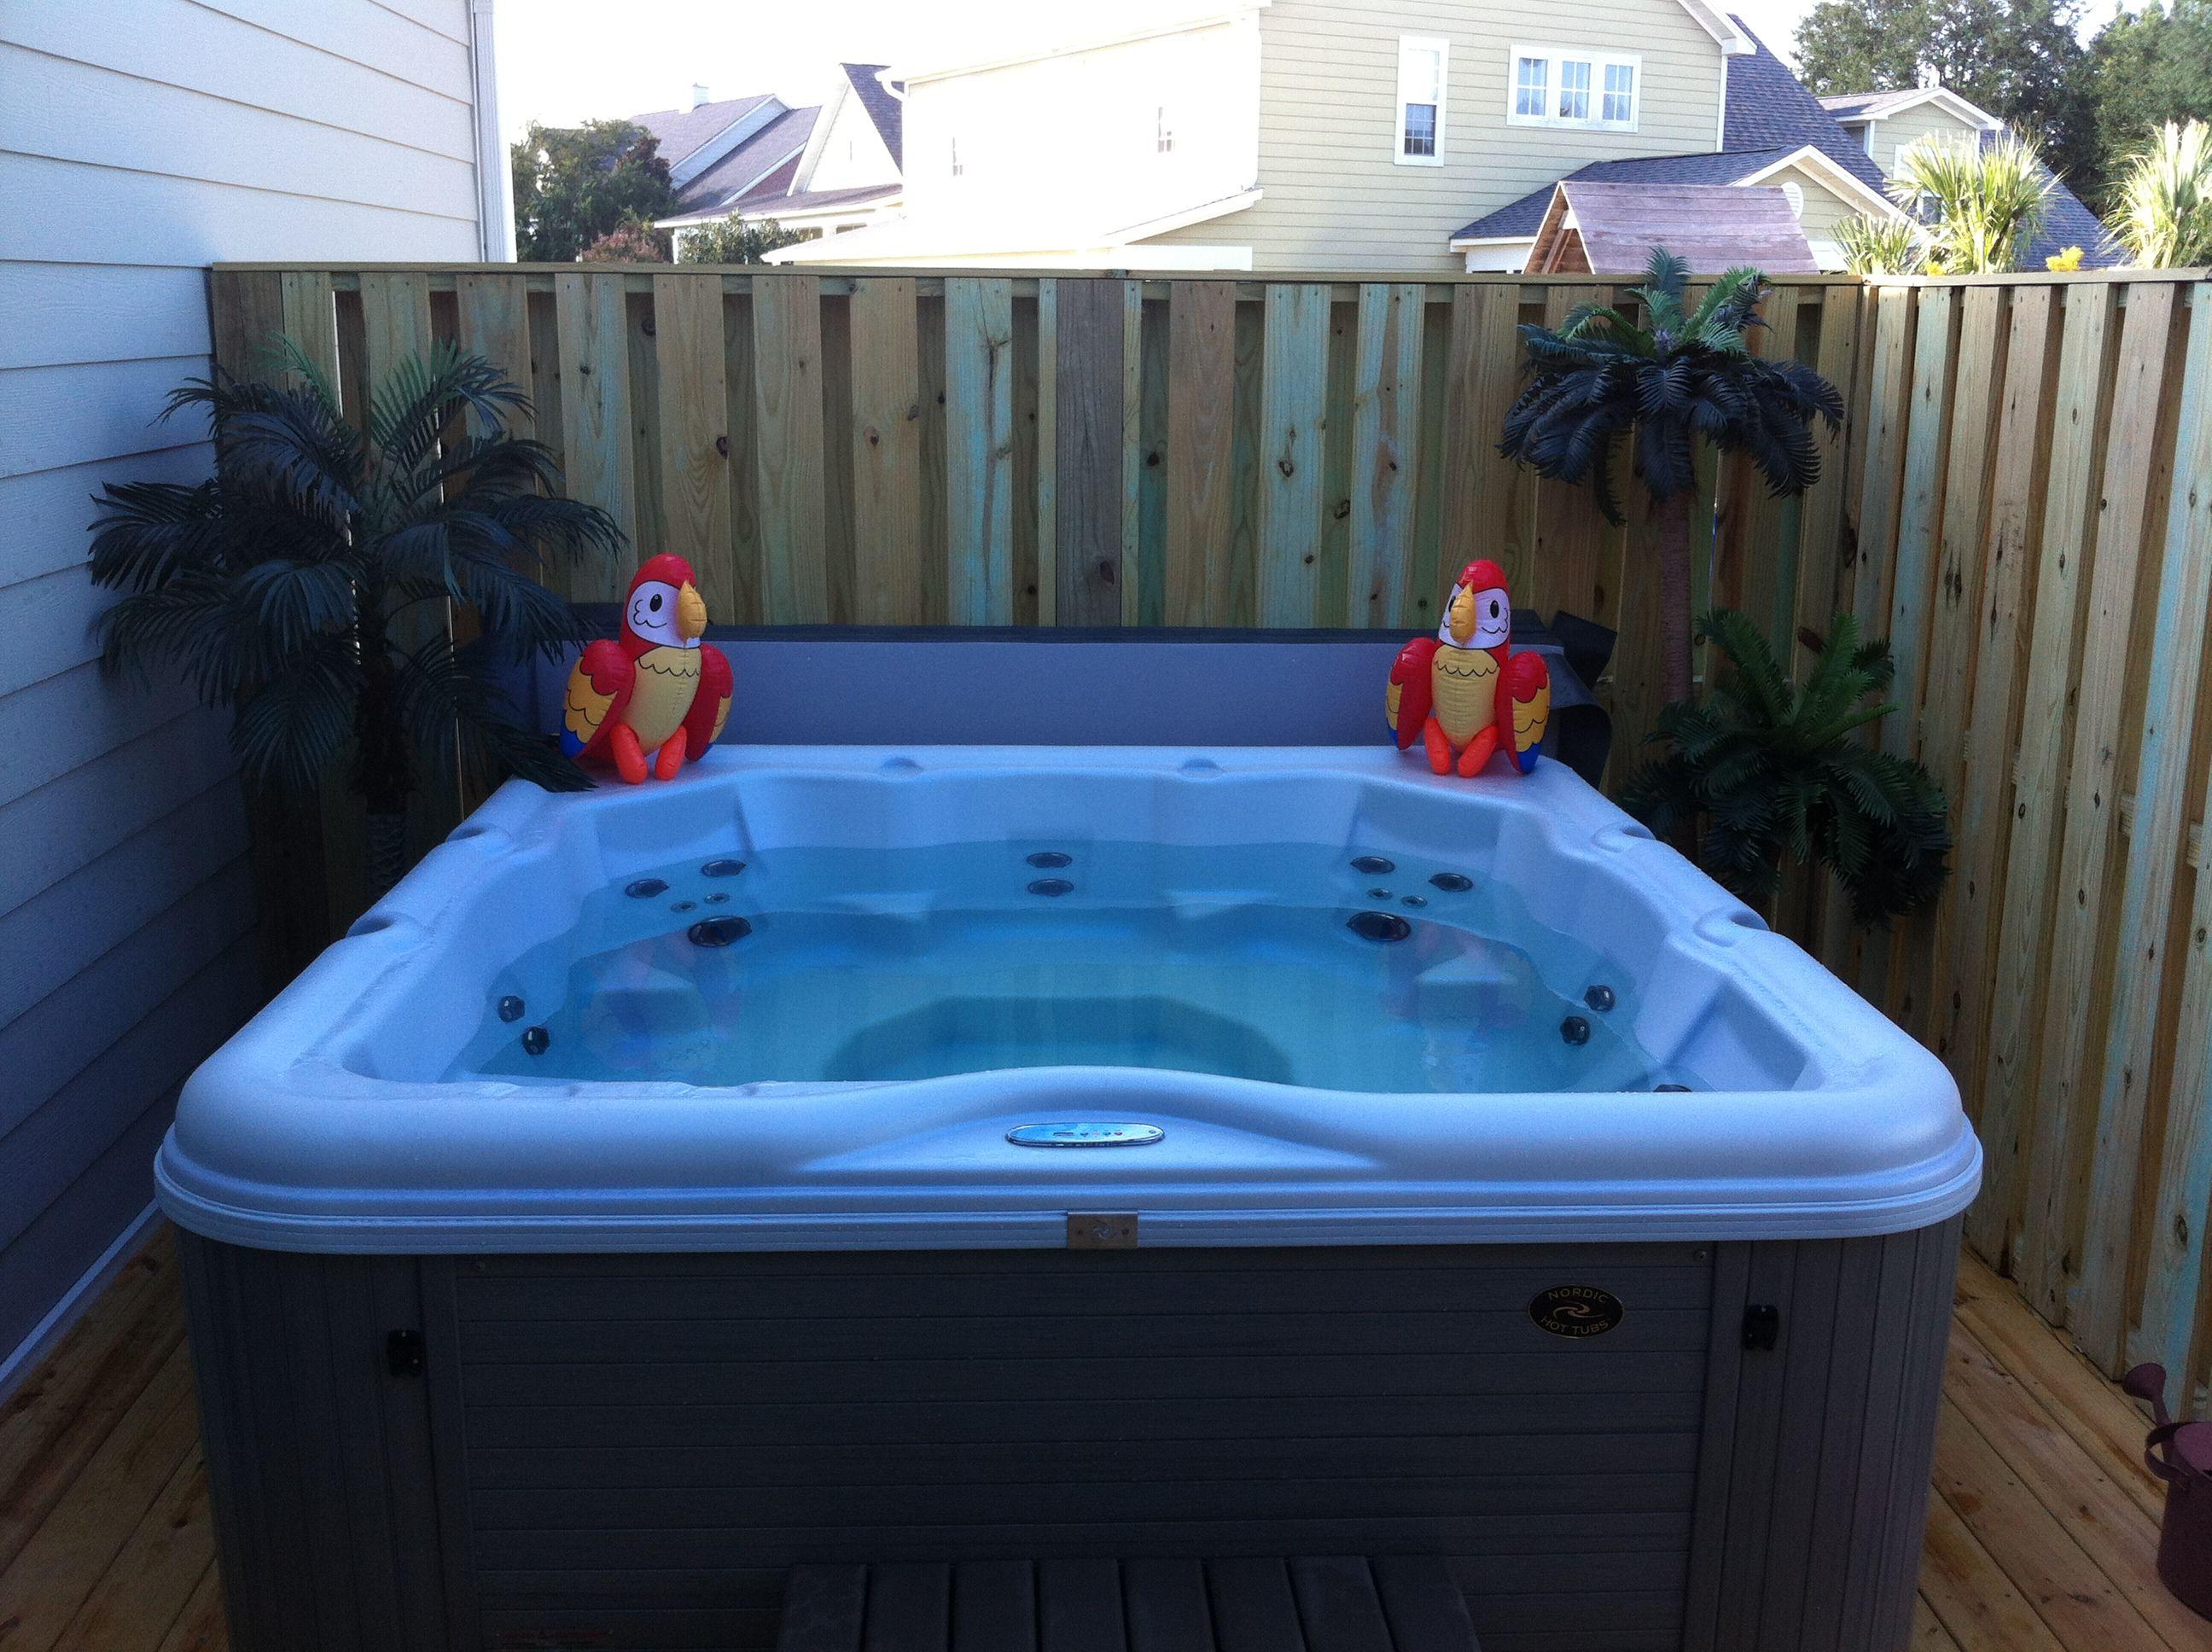 Hot tub w/shadow box privacy walls. | Deck Project | Pinterest ...